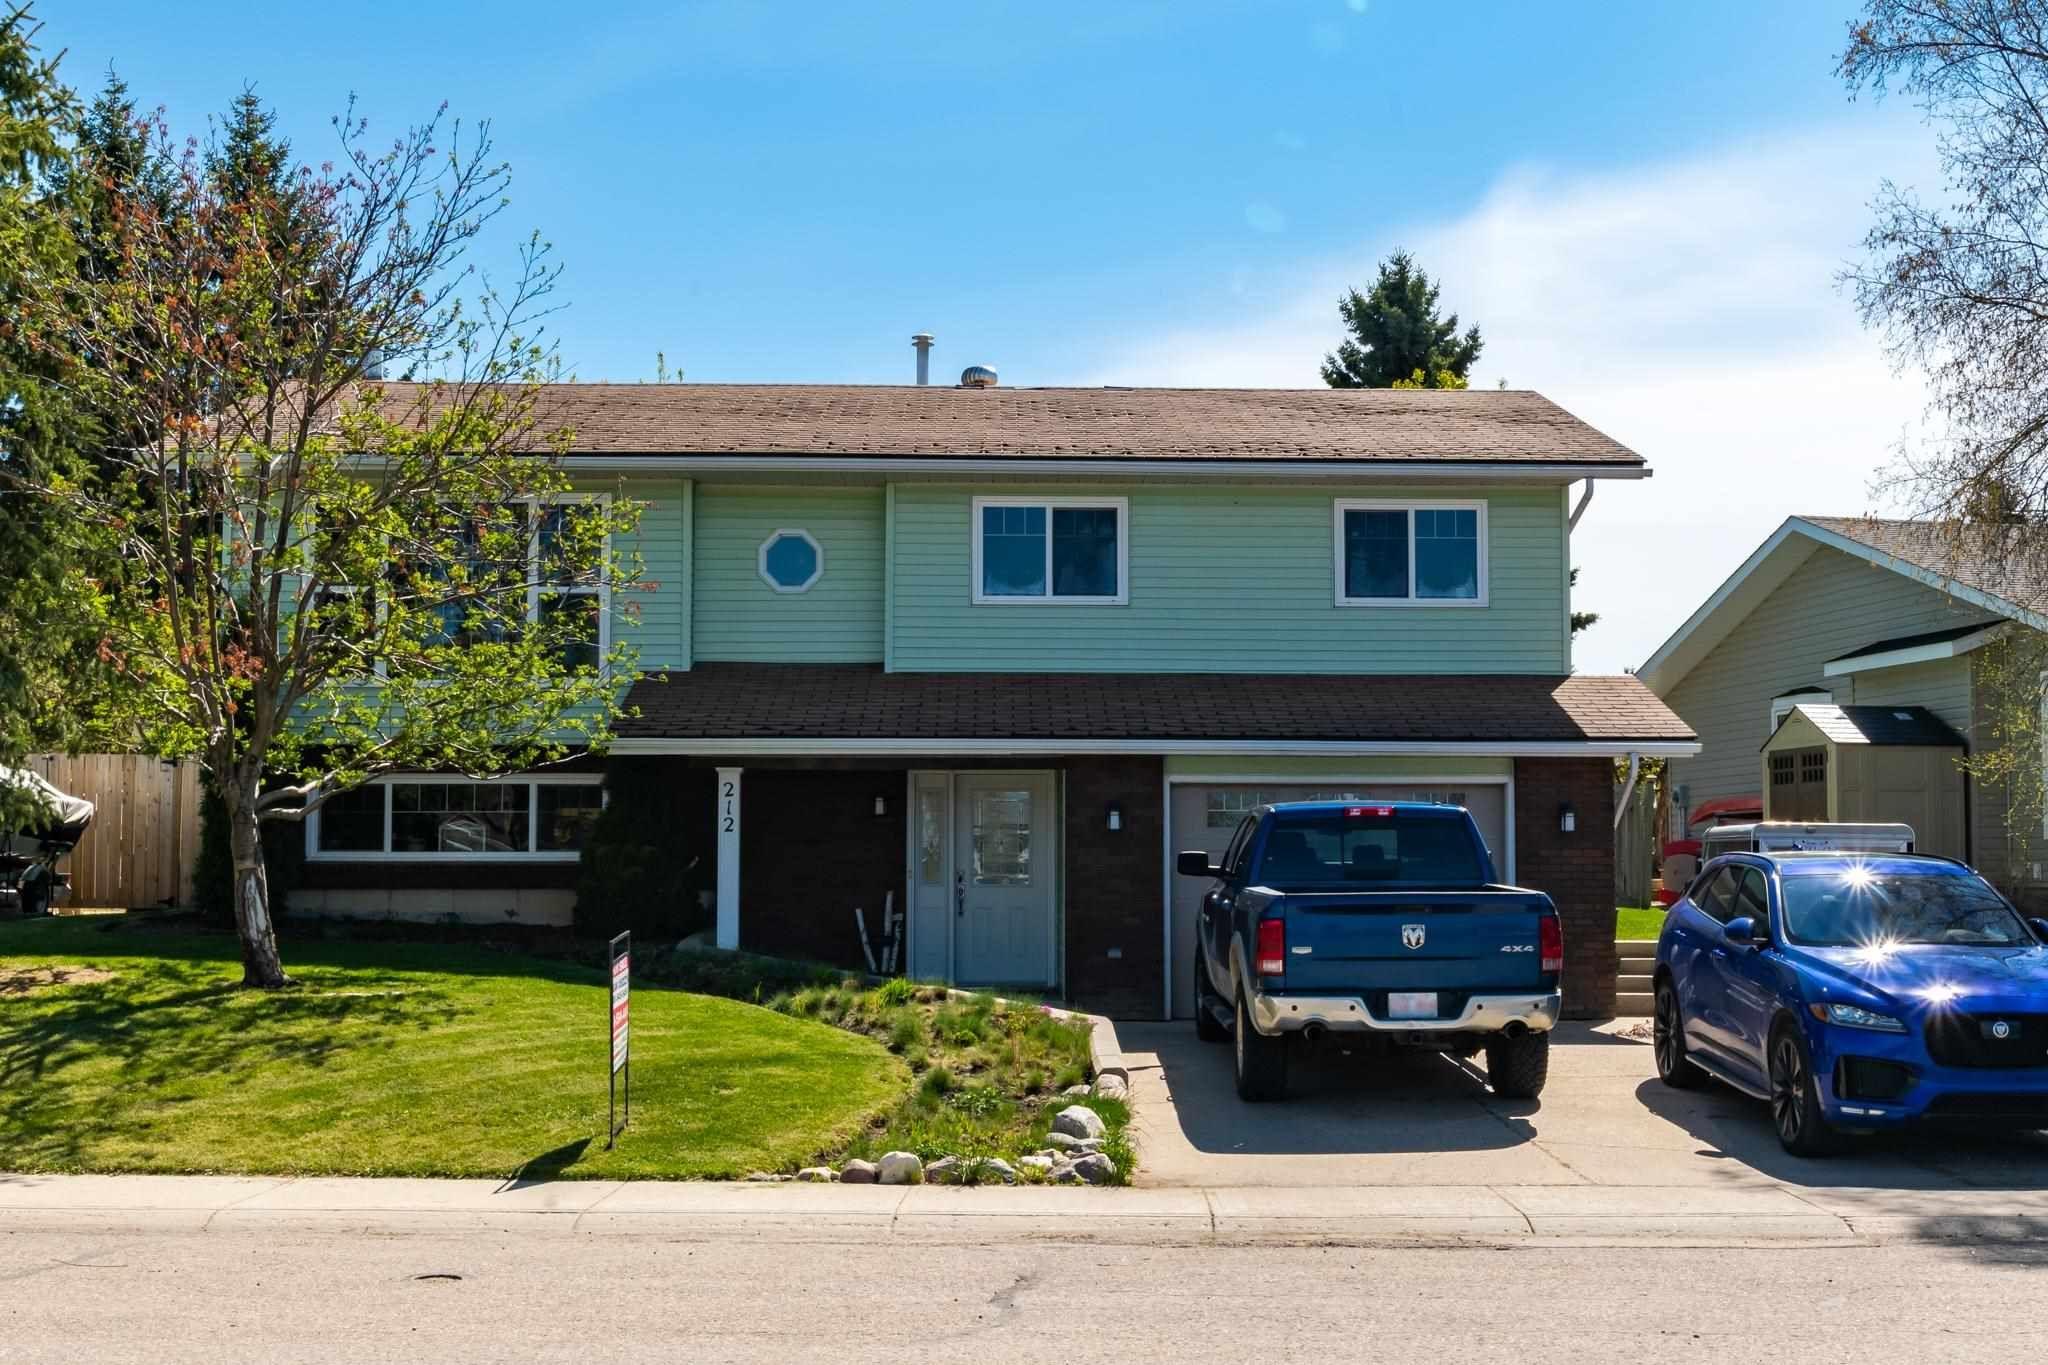 Main Photo: 212 21 Street: Cold Lake House for sale : MLS®# E4243125